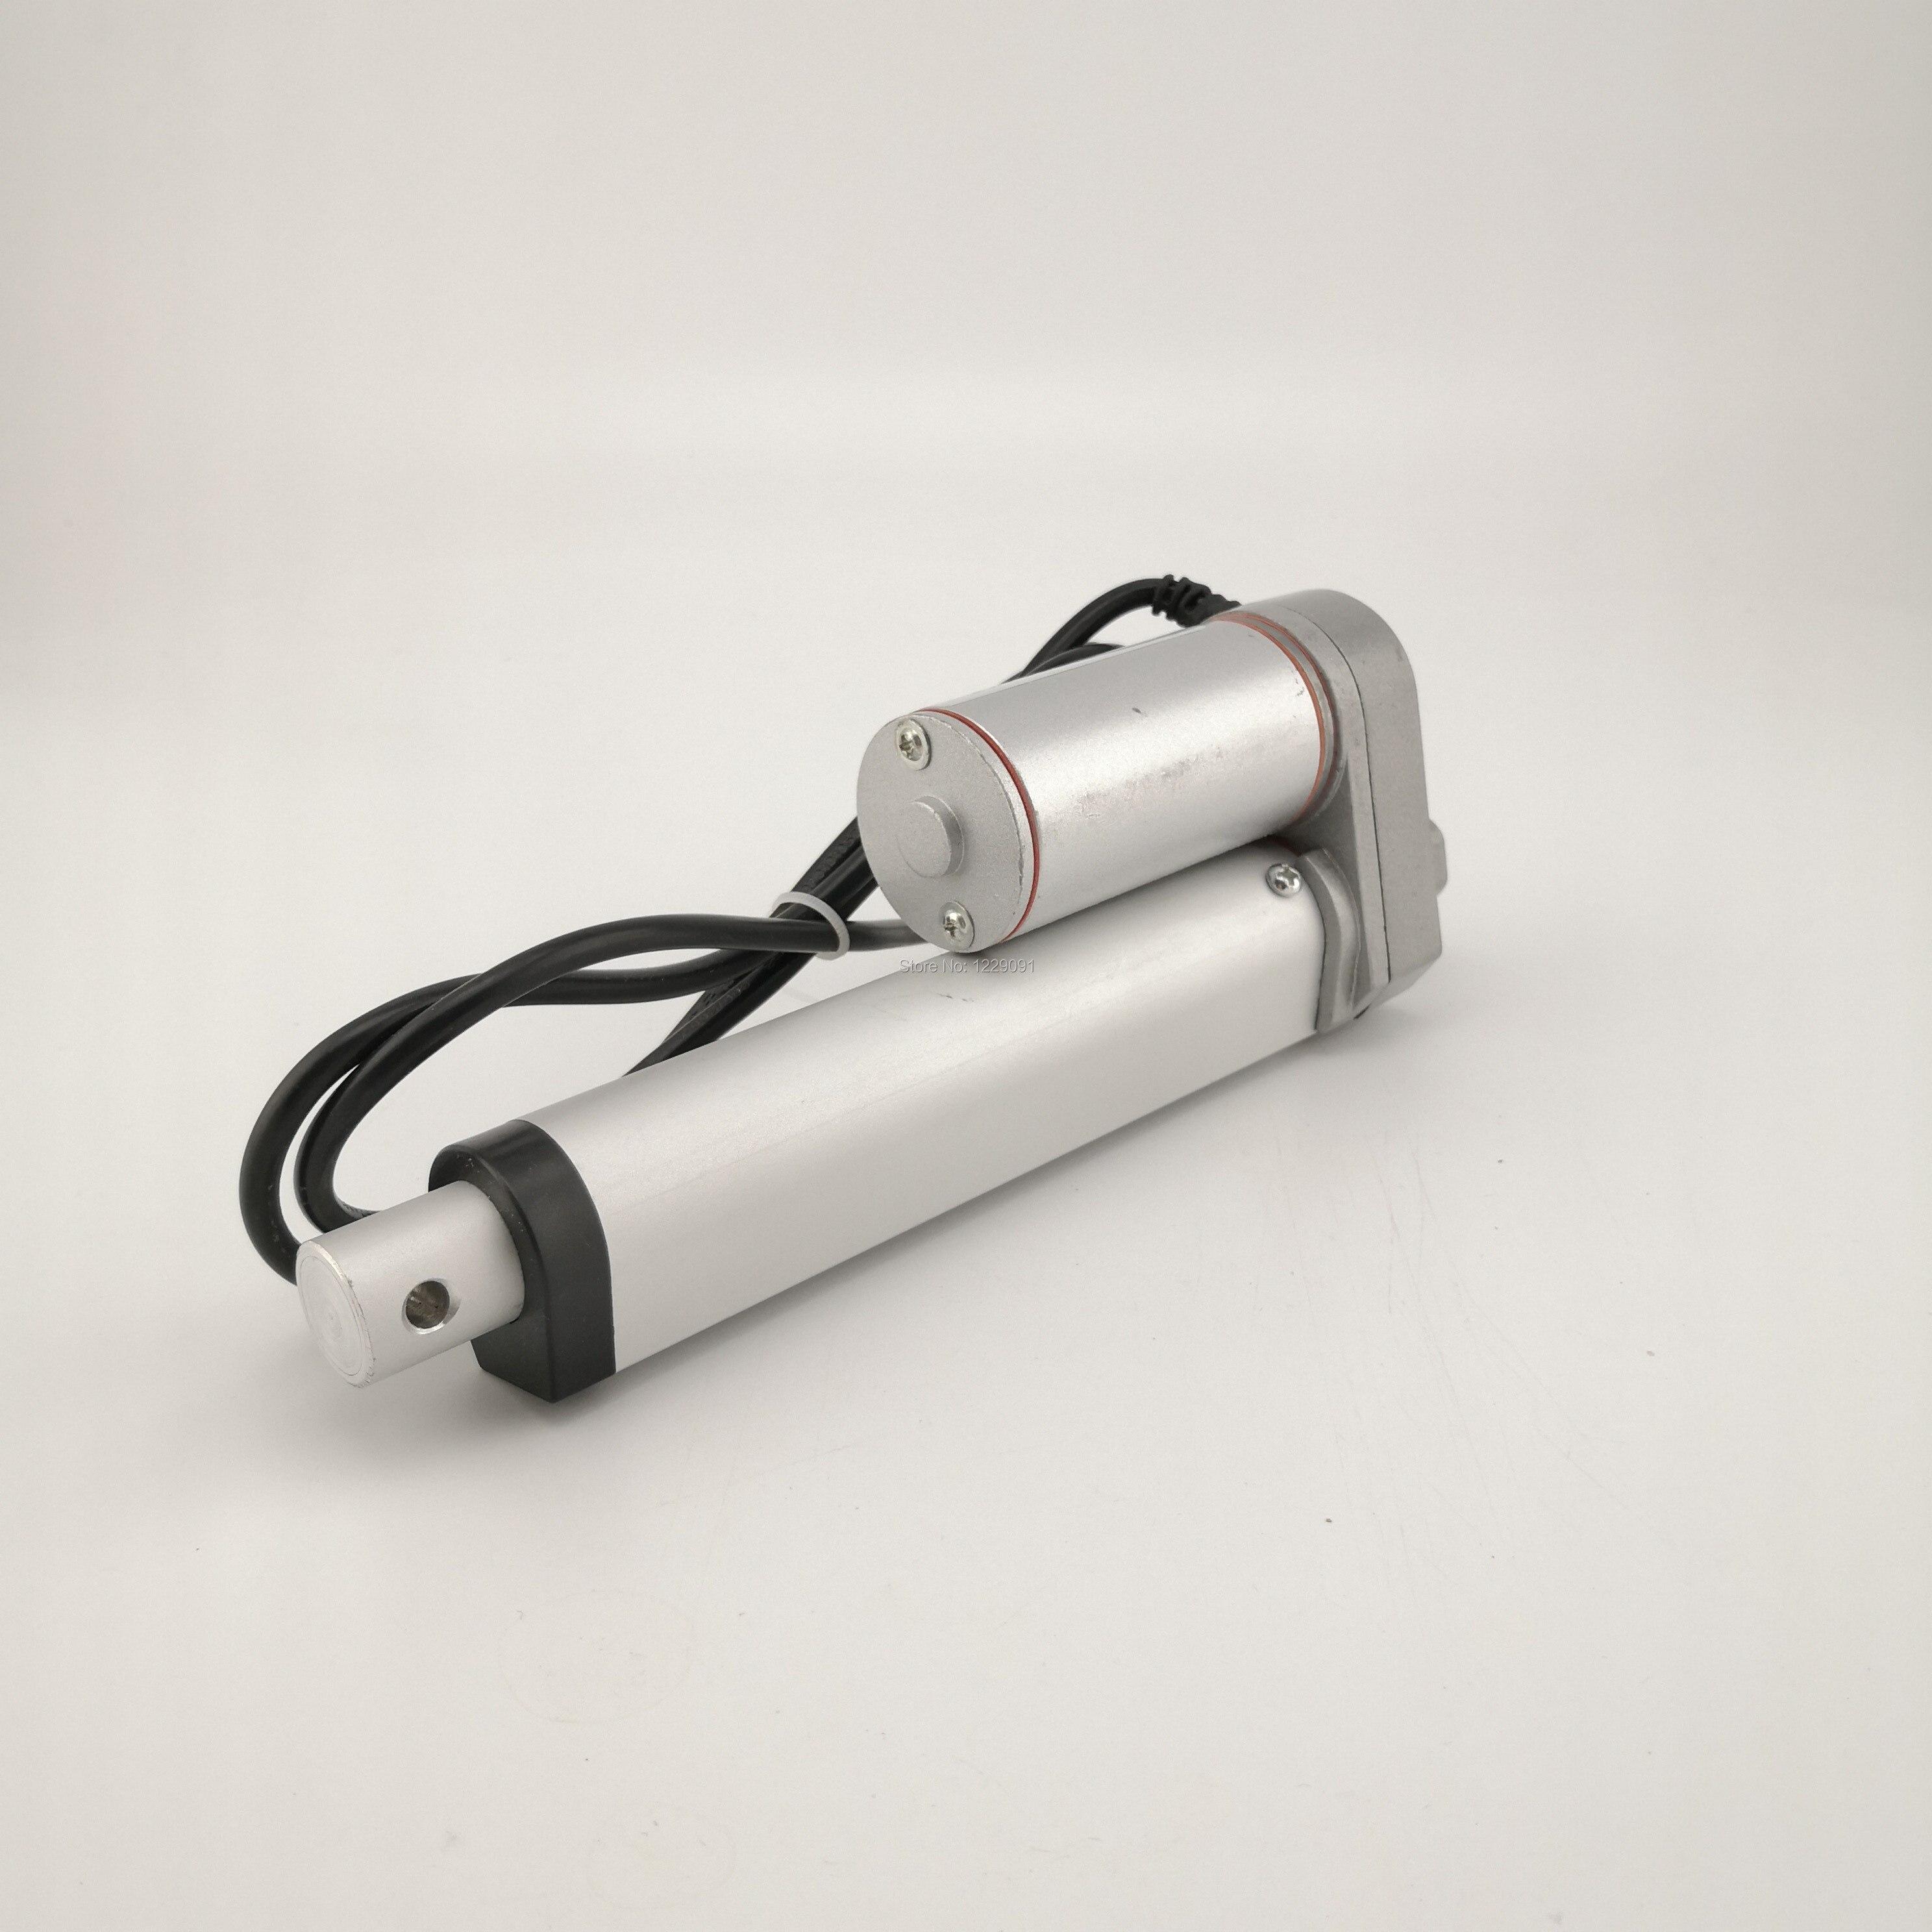 Electric Linear Actuator 450mm Stroke Linear Motor Controller DC12V 24V 36V 48V